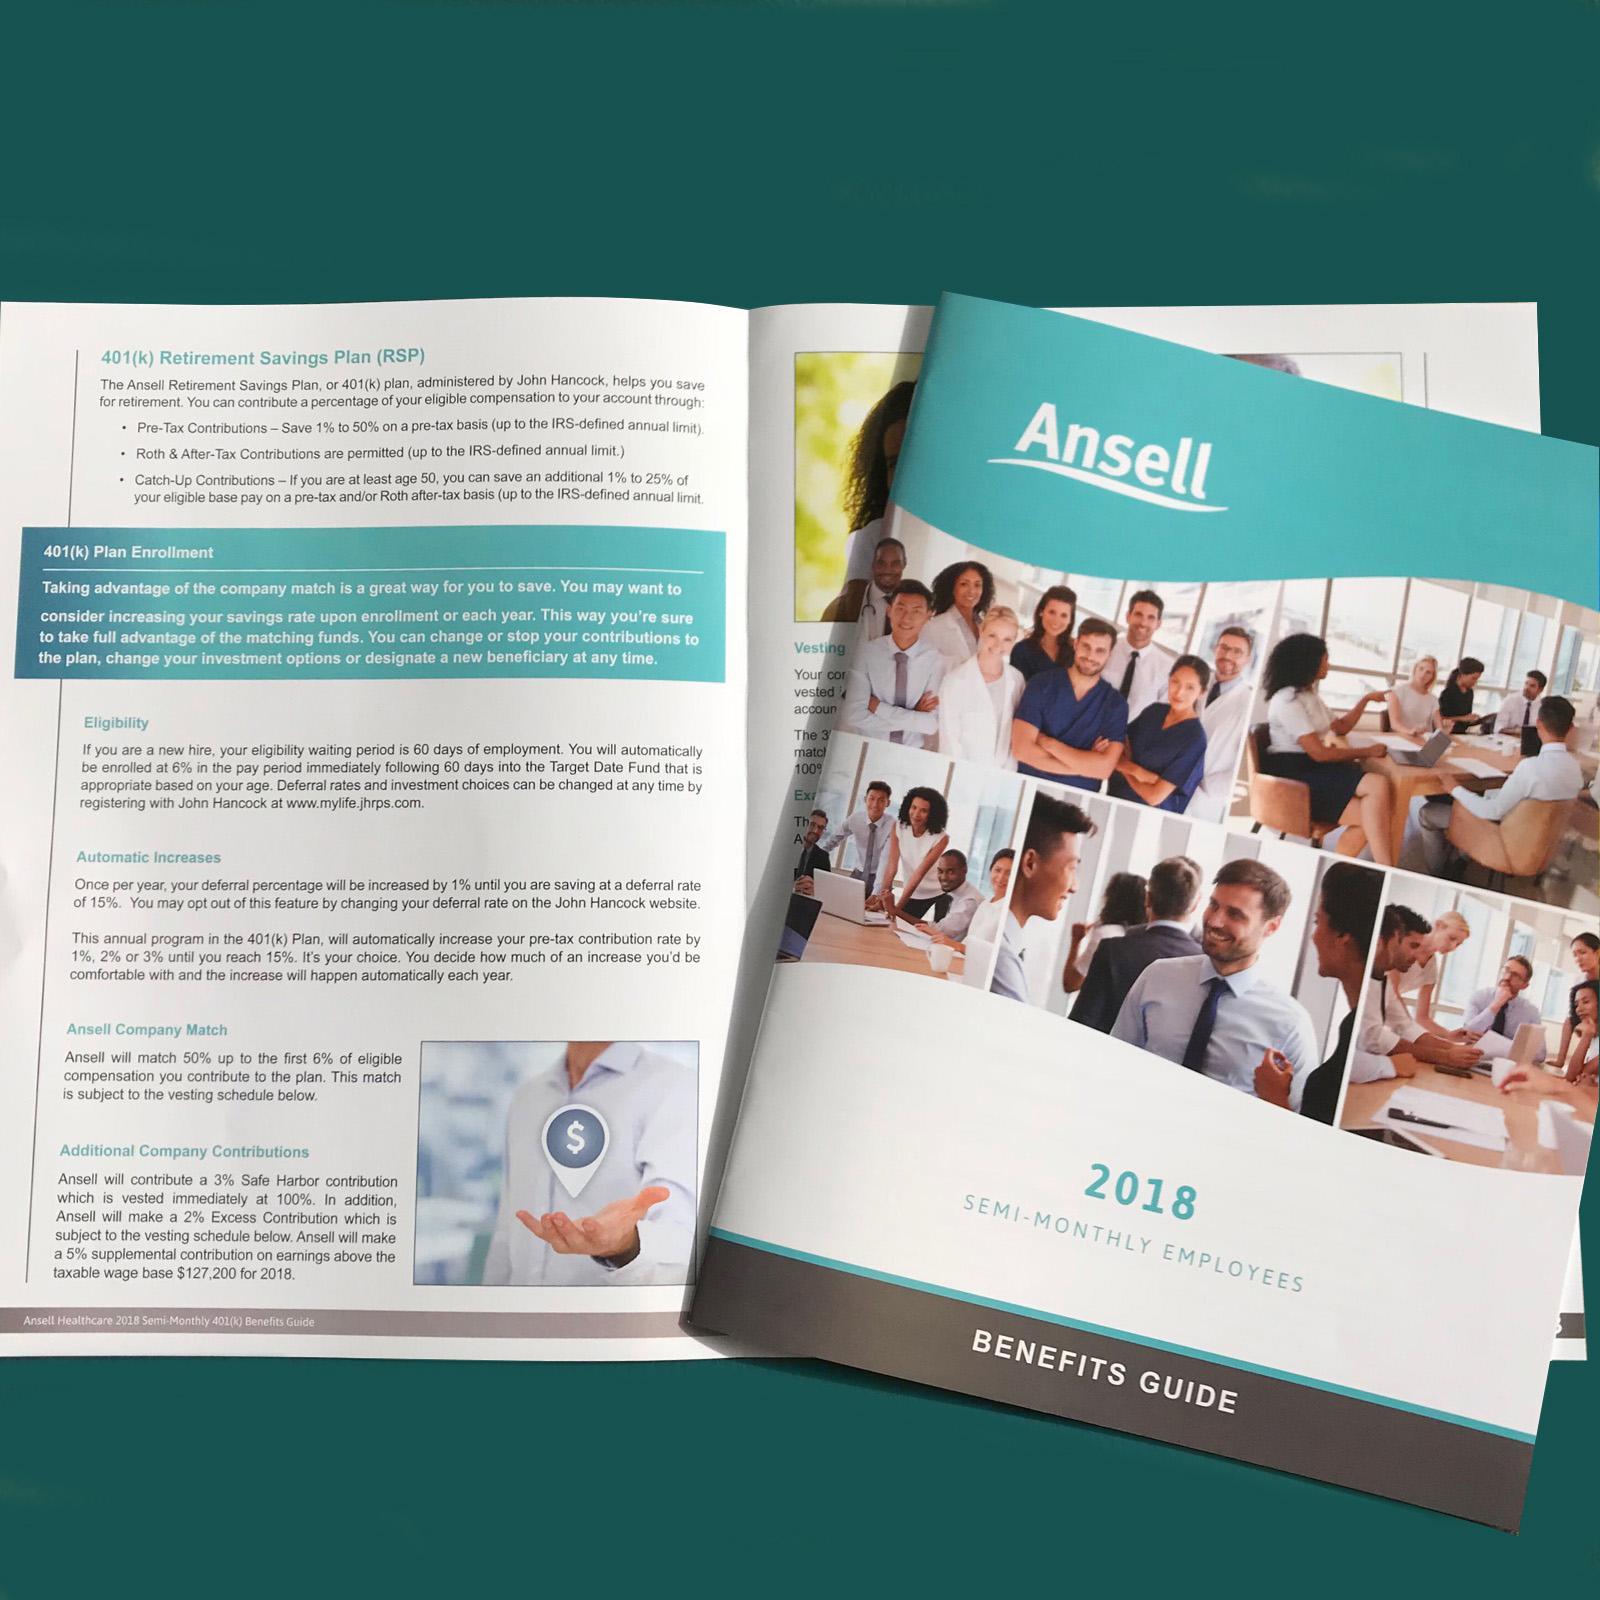 Ansell Benefits Guide.jpg